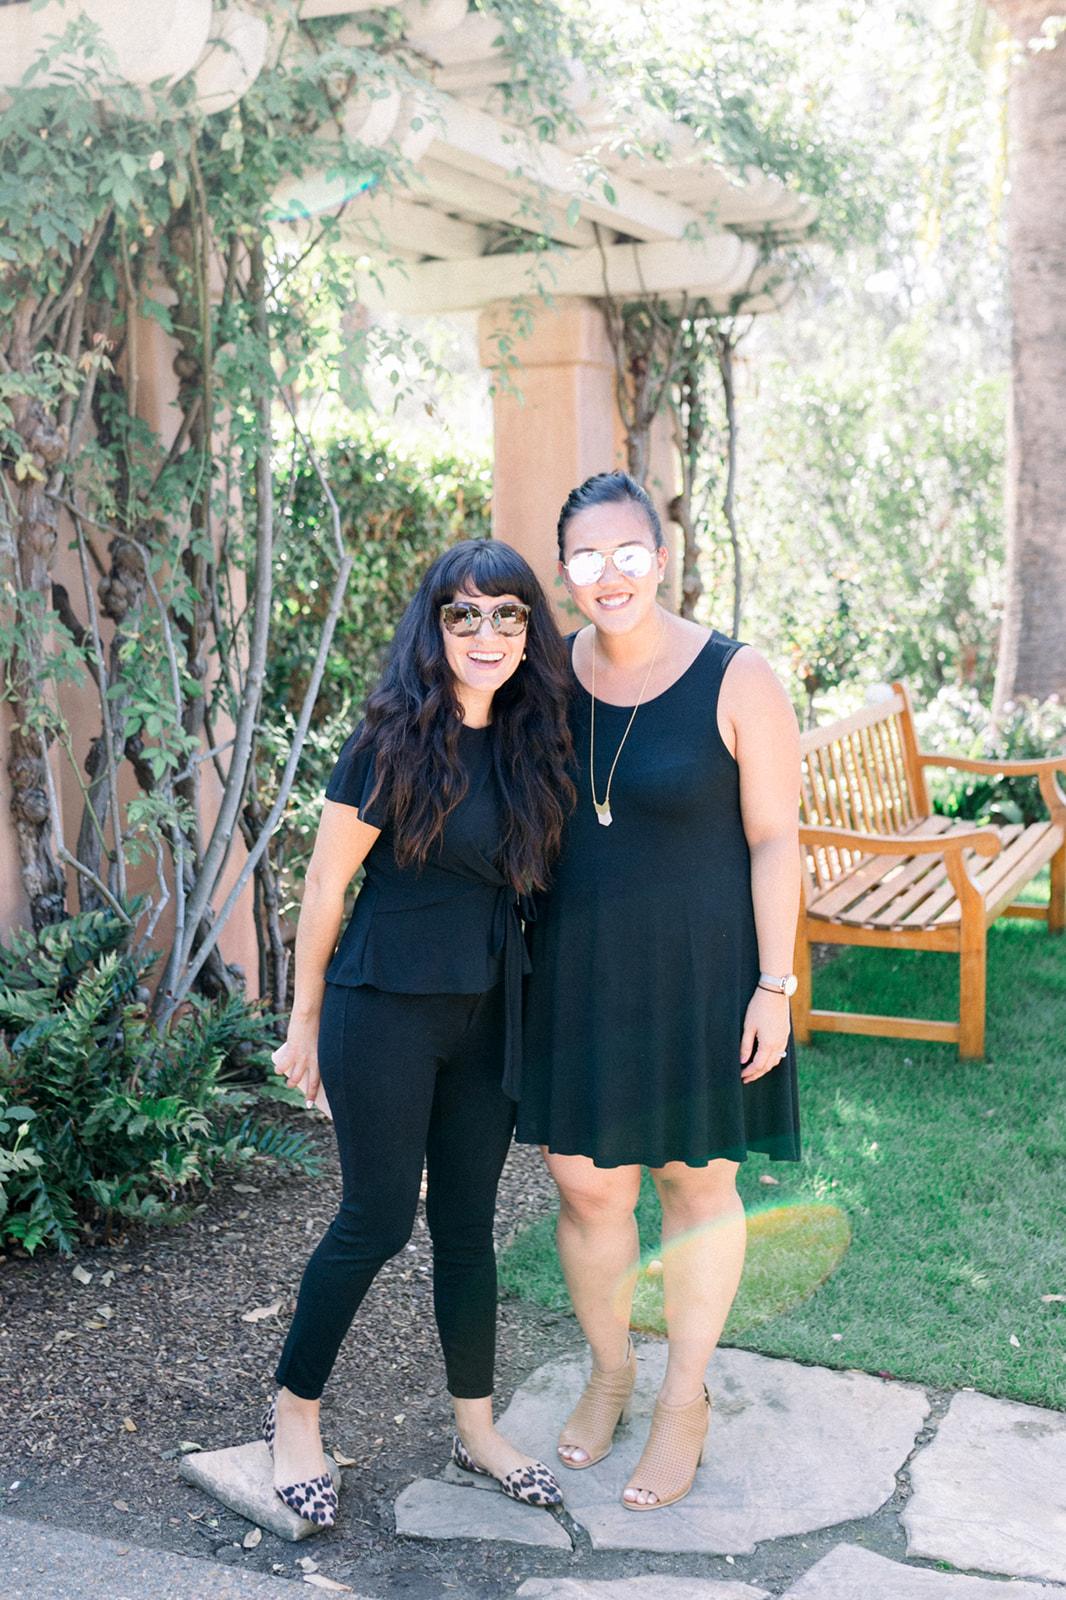 Alexis Sanabria, Vendor Partnerships Manager & Cami Tran, Events Manager for Exquisite Weddings Magazine